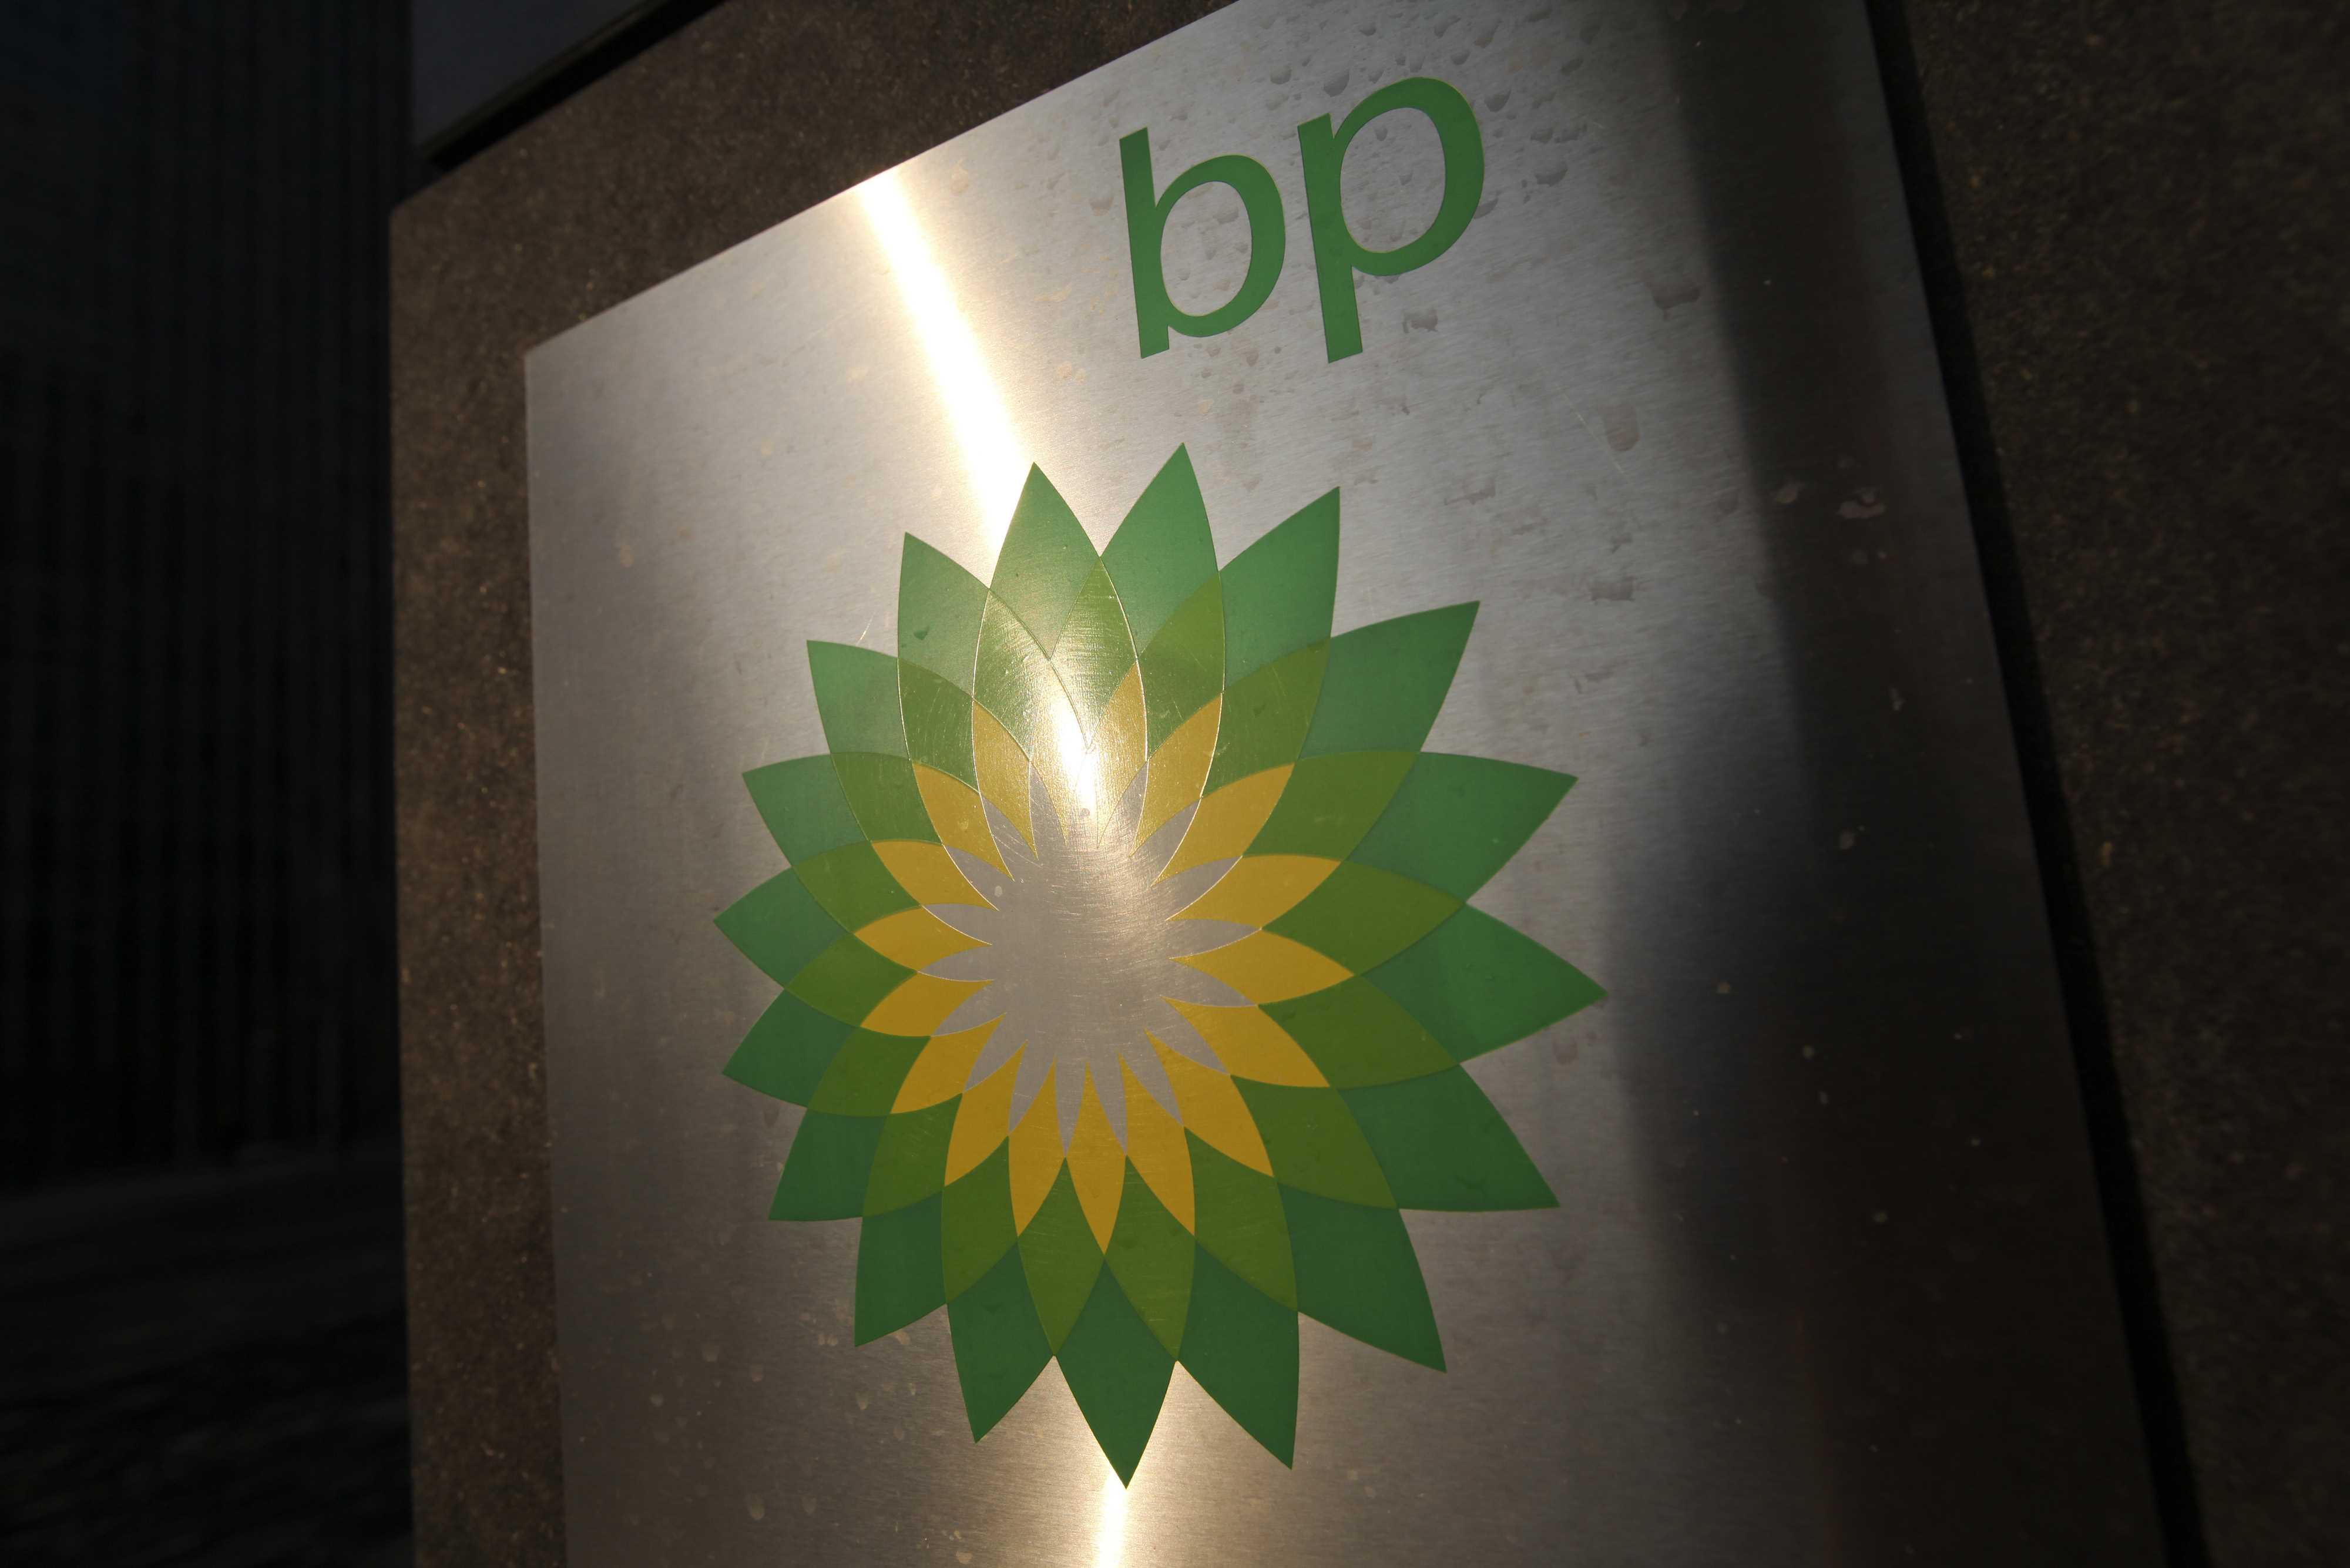 U.S. hiding evidence on size of Gulf oil spill: BP